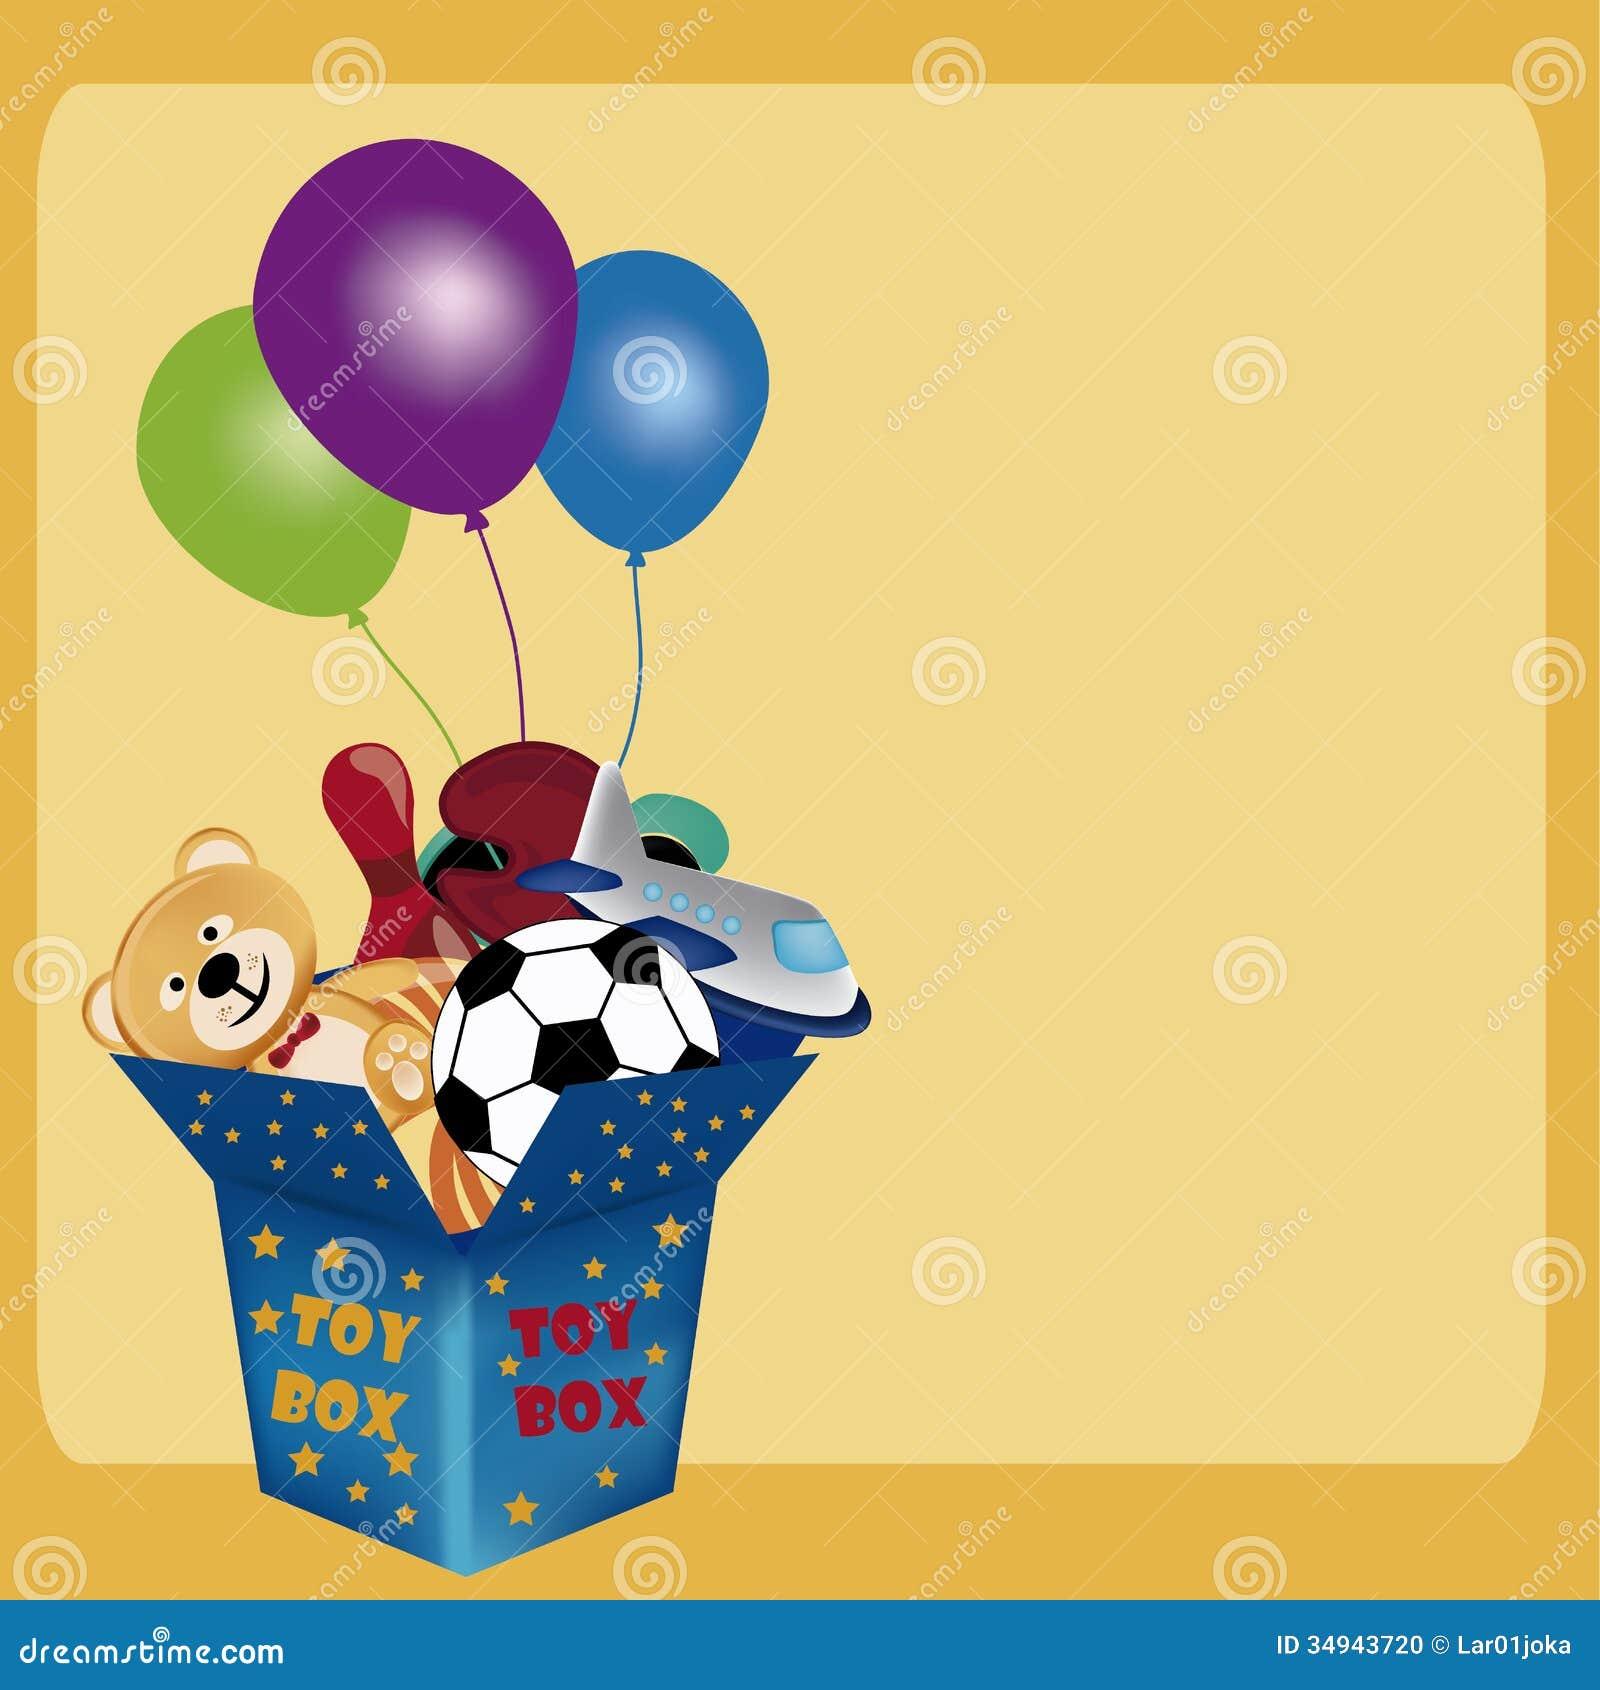 Toy Box Stock Photo - Image: 34943720